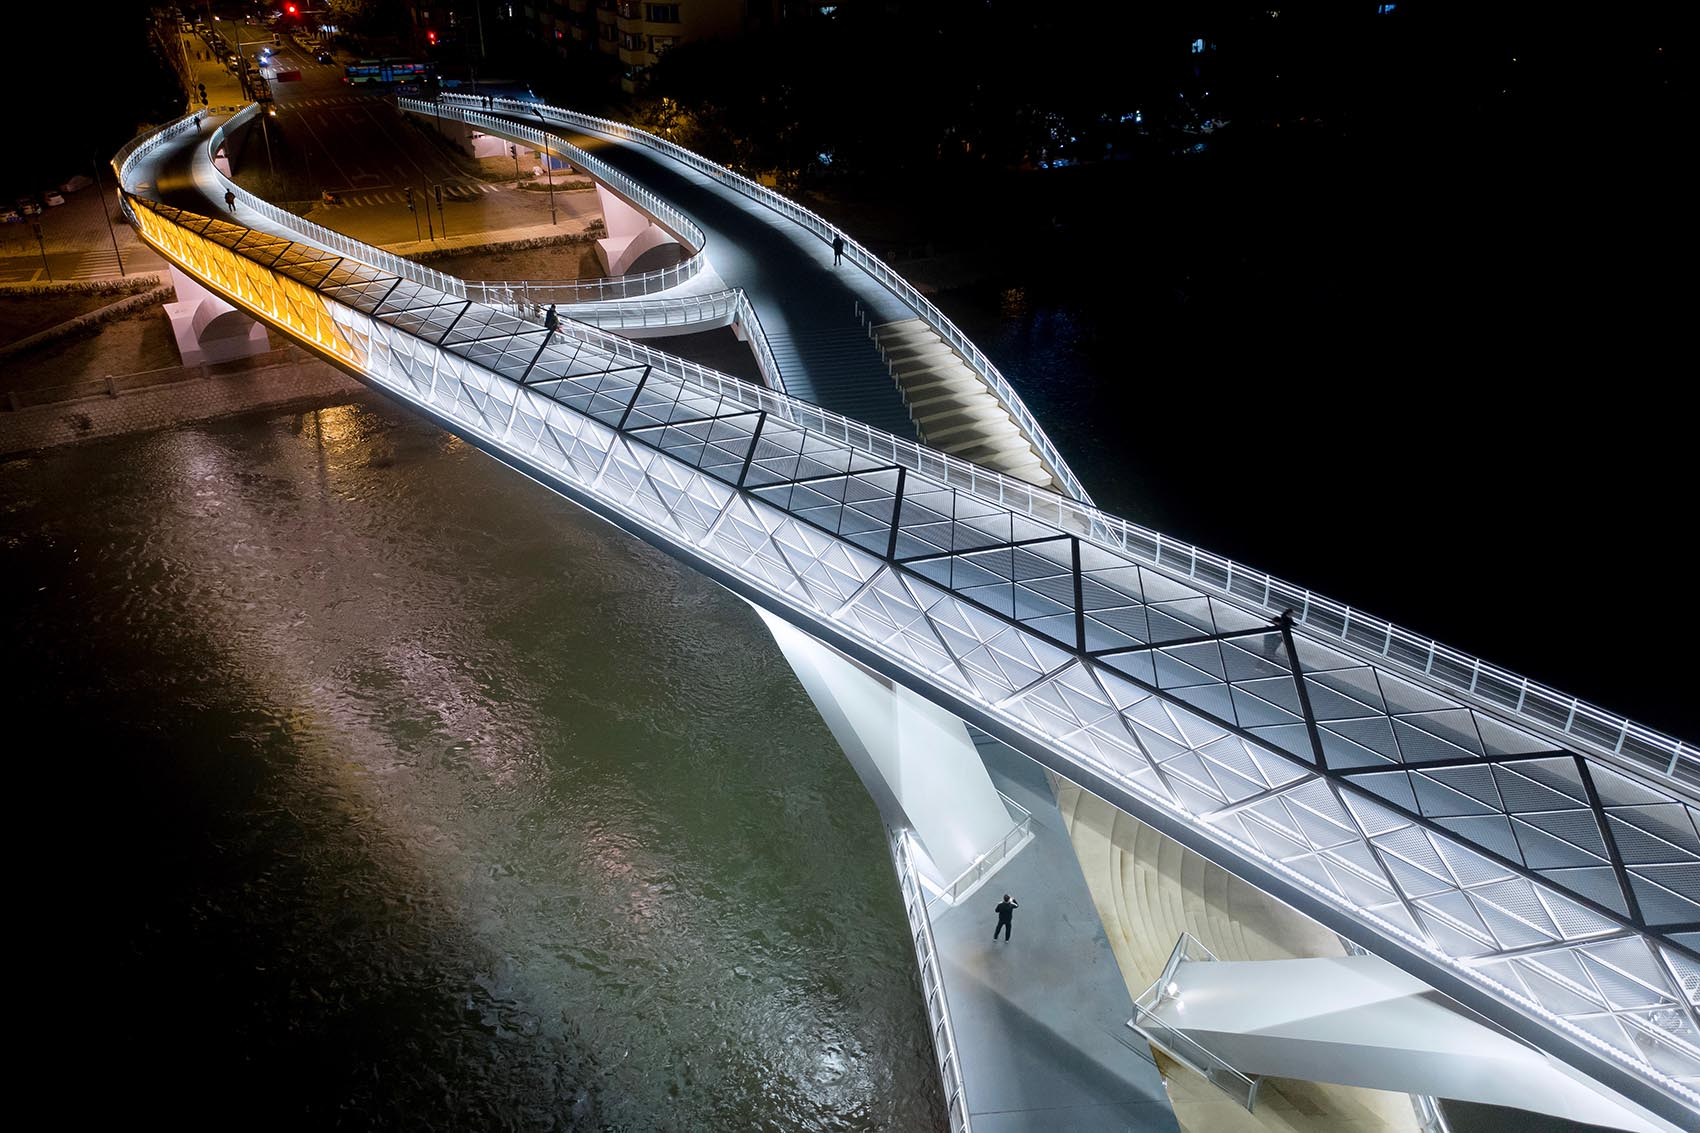 Nightshot 五岔子大橋 - Wuchazi Bridge (INFINITE LOOP)